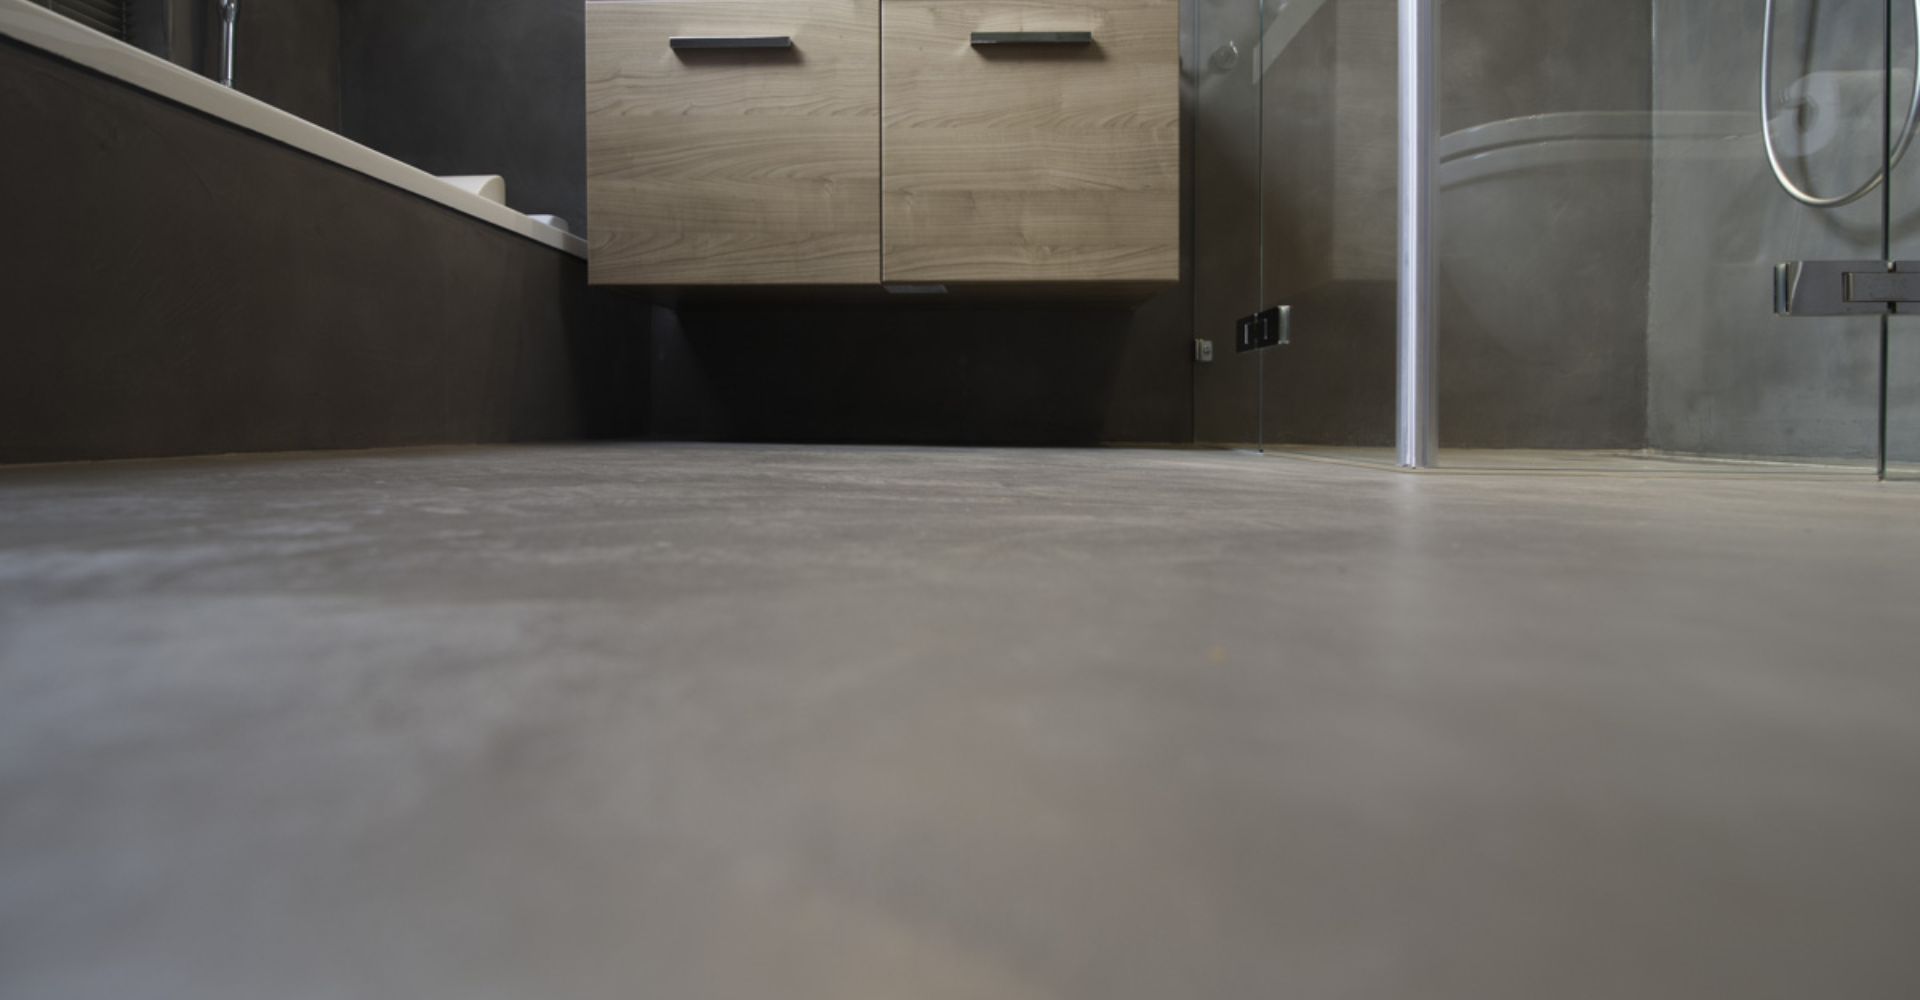 Beton In Badkamer : Beton cire badkamer beton cire